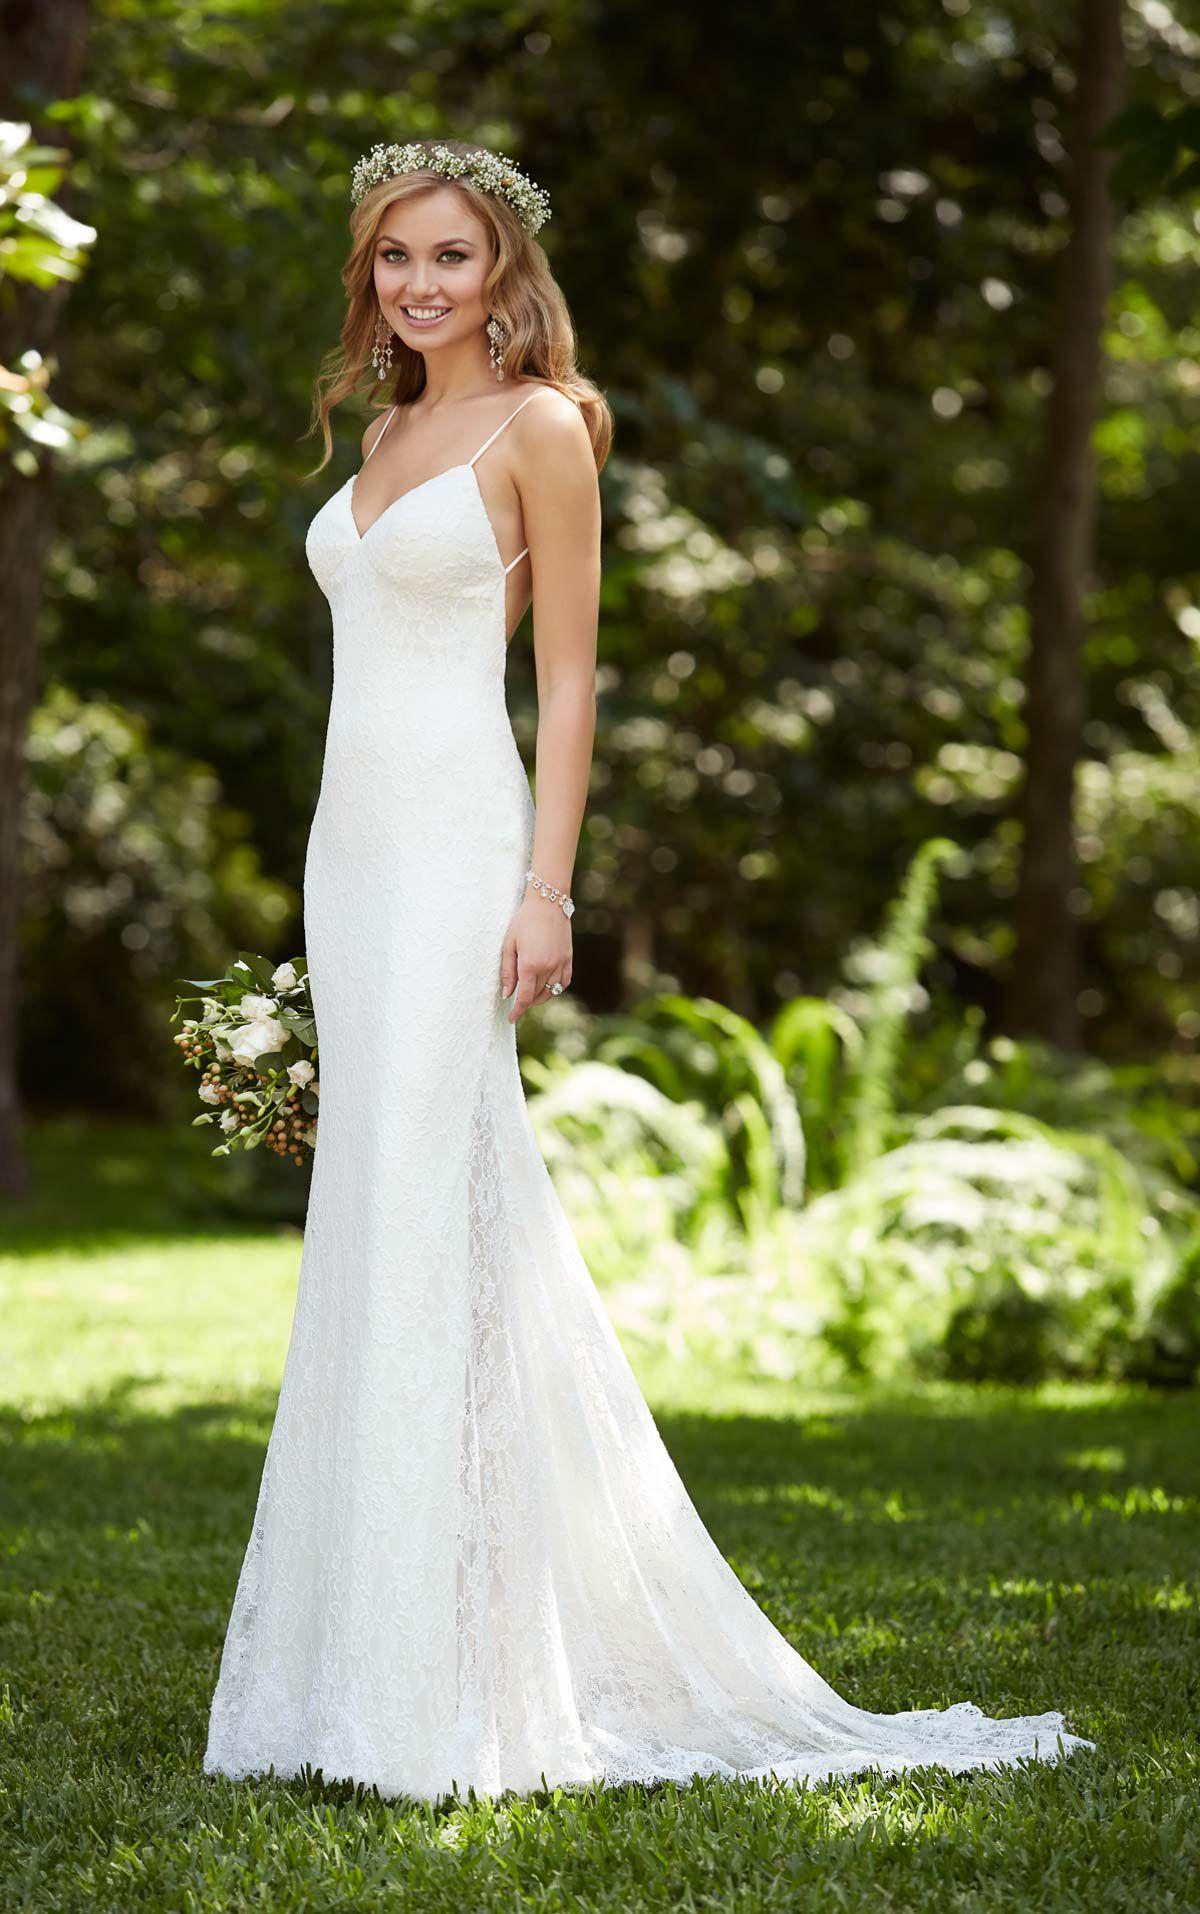 Wedding dress styles silhouette rustic wedding chic wedding gowns junglespirit Choice Image